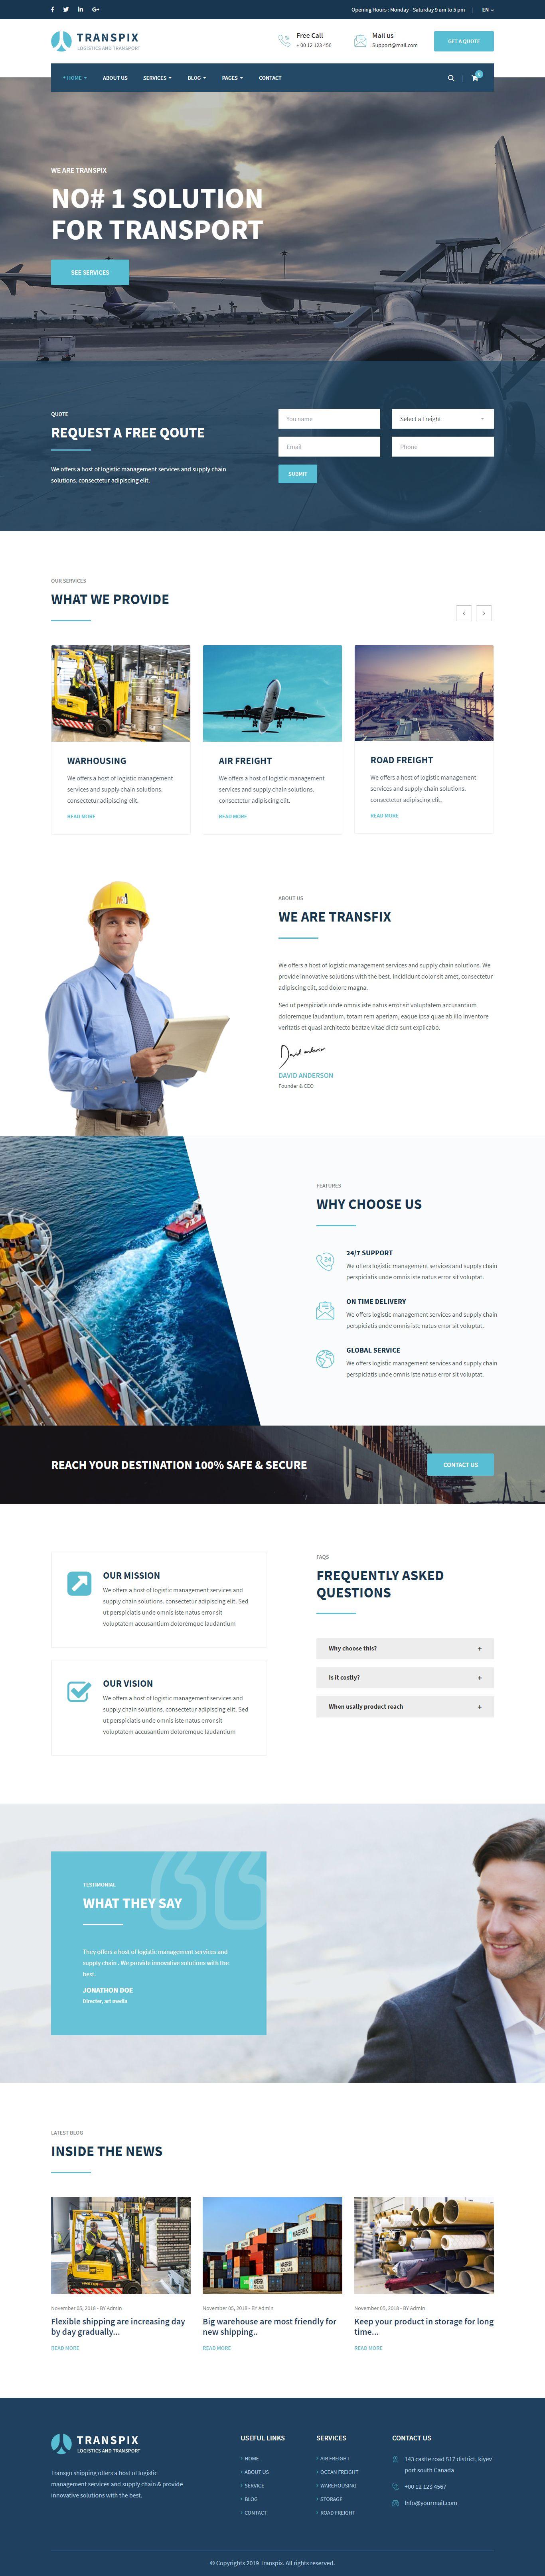 Warehouse Website Template Tutore